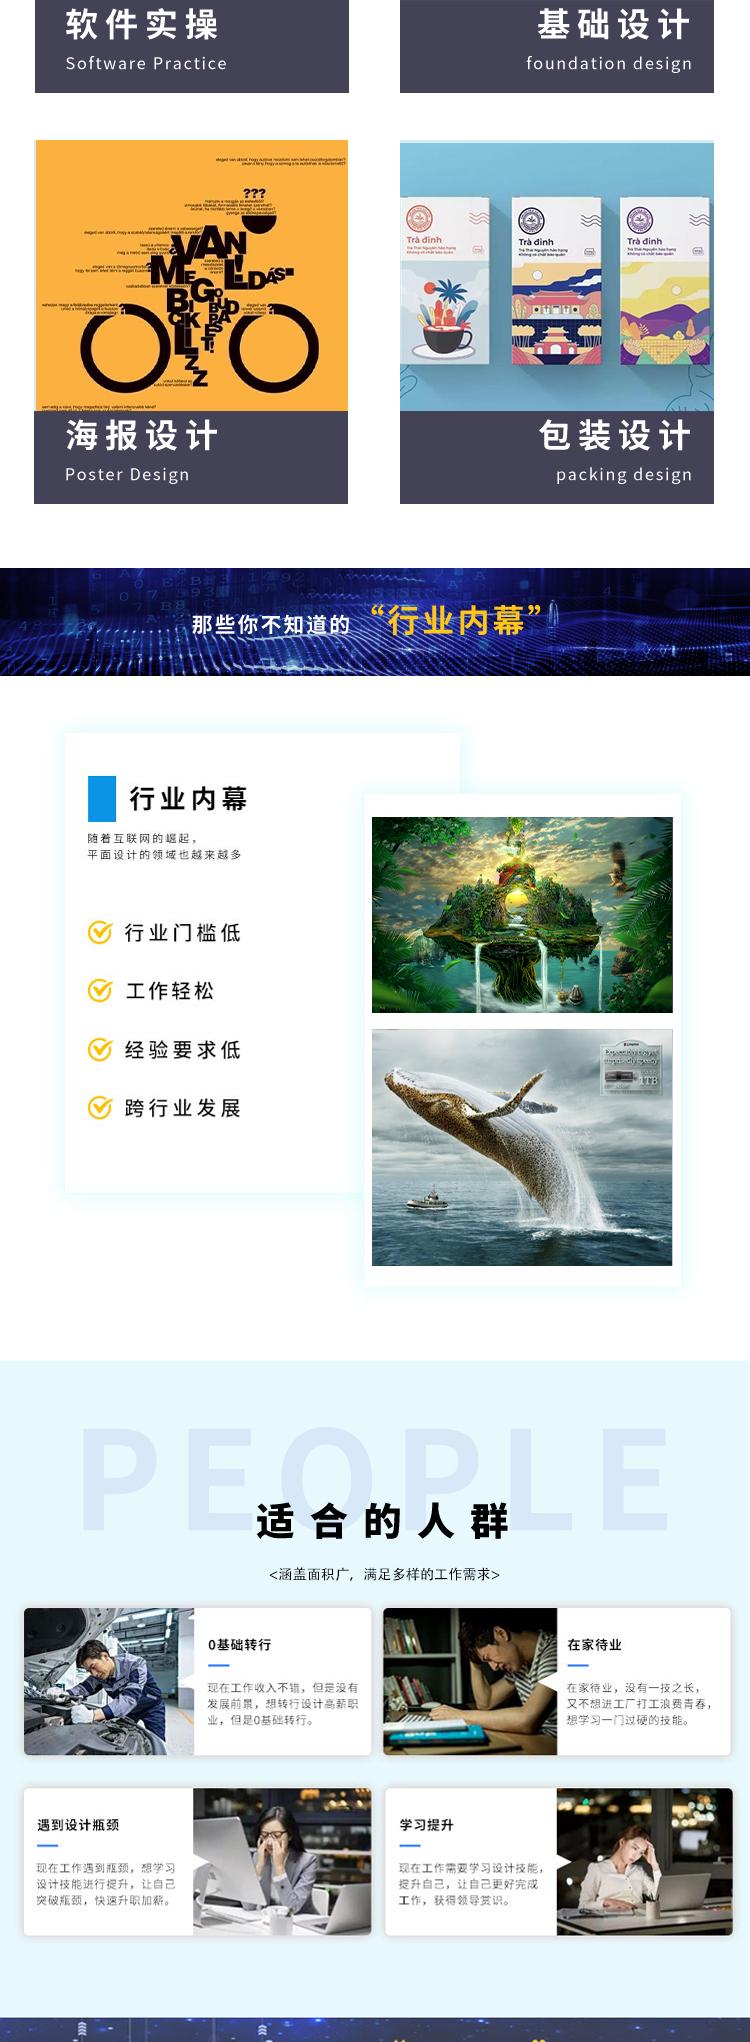 10EXCEL实战速成班课程详情页(1)_03.jpg